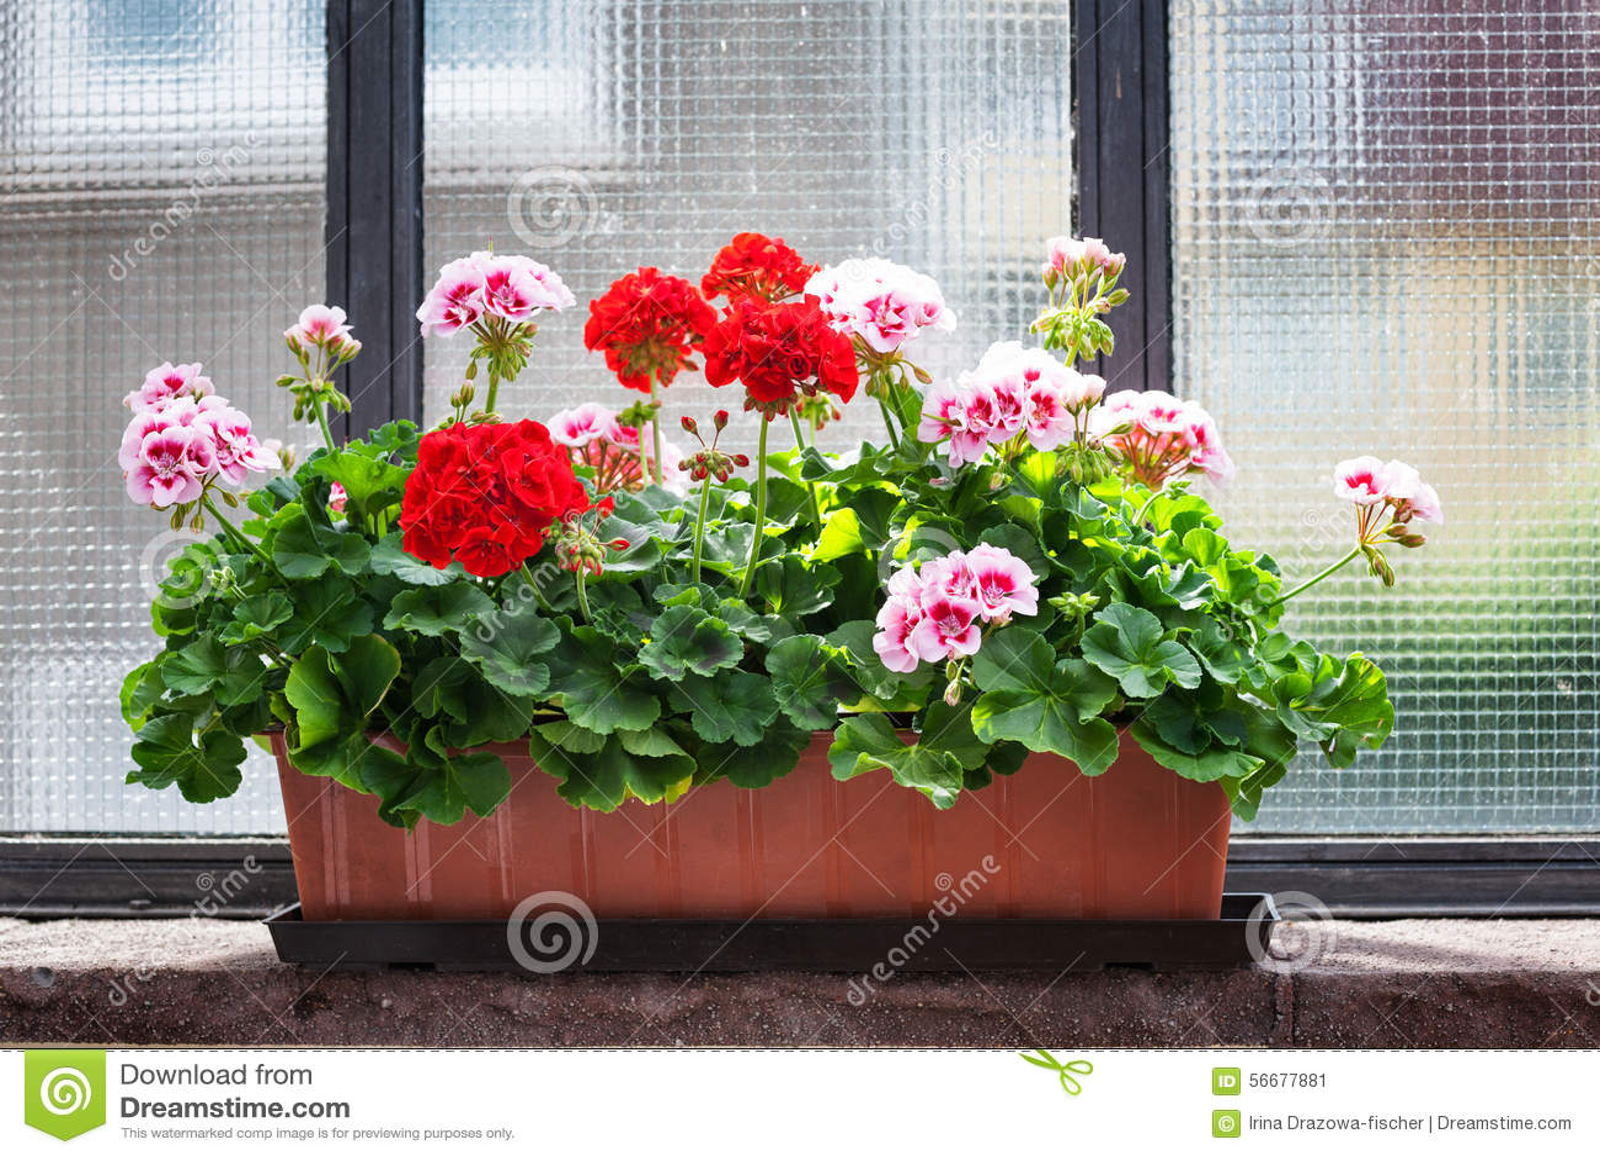 Geranium On Window Sill